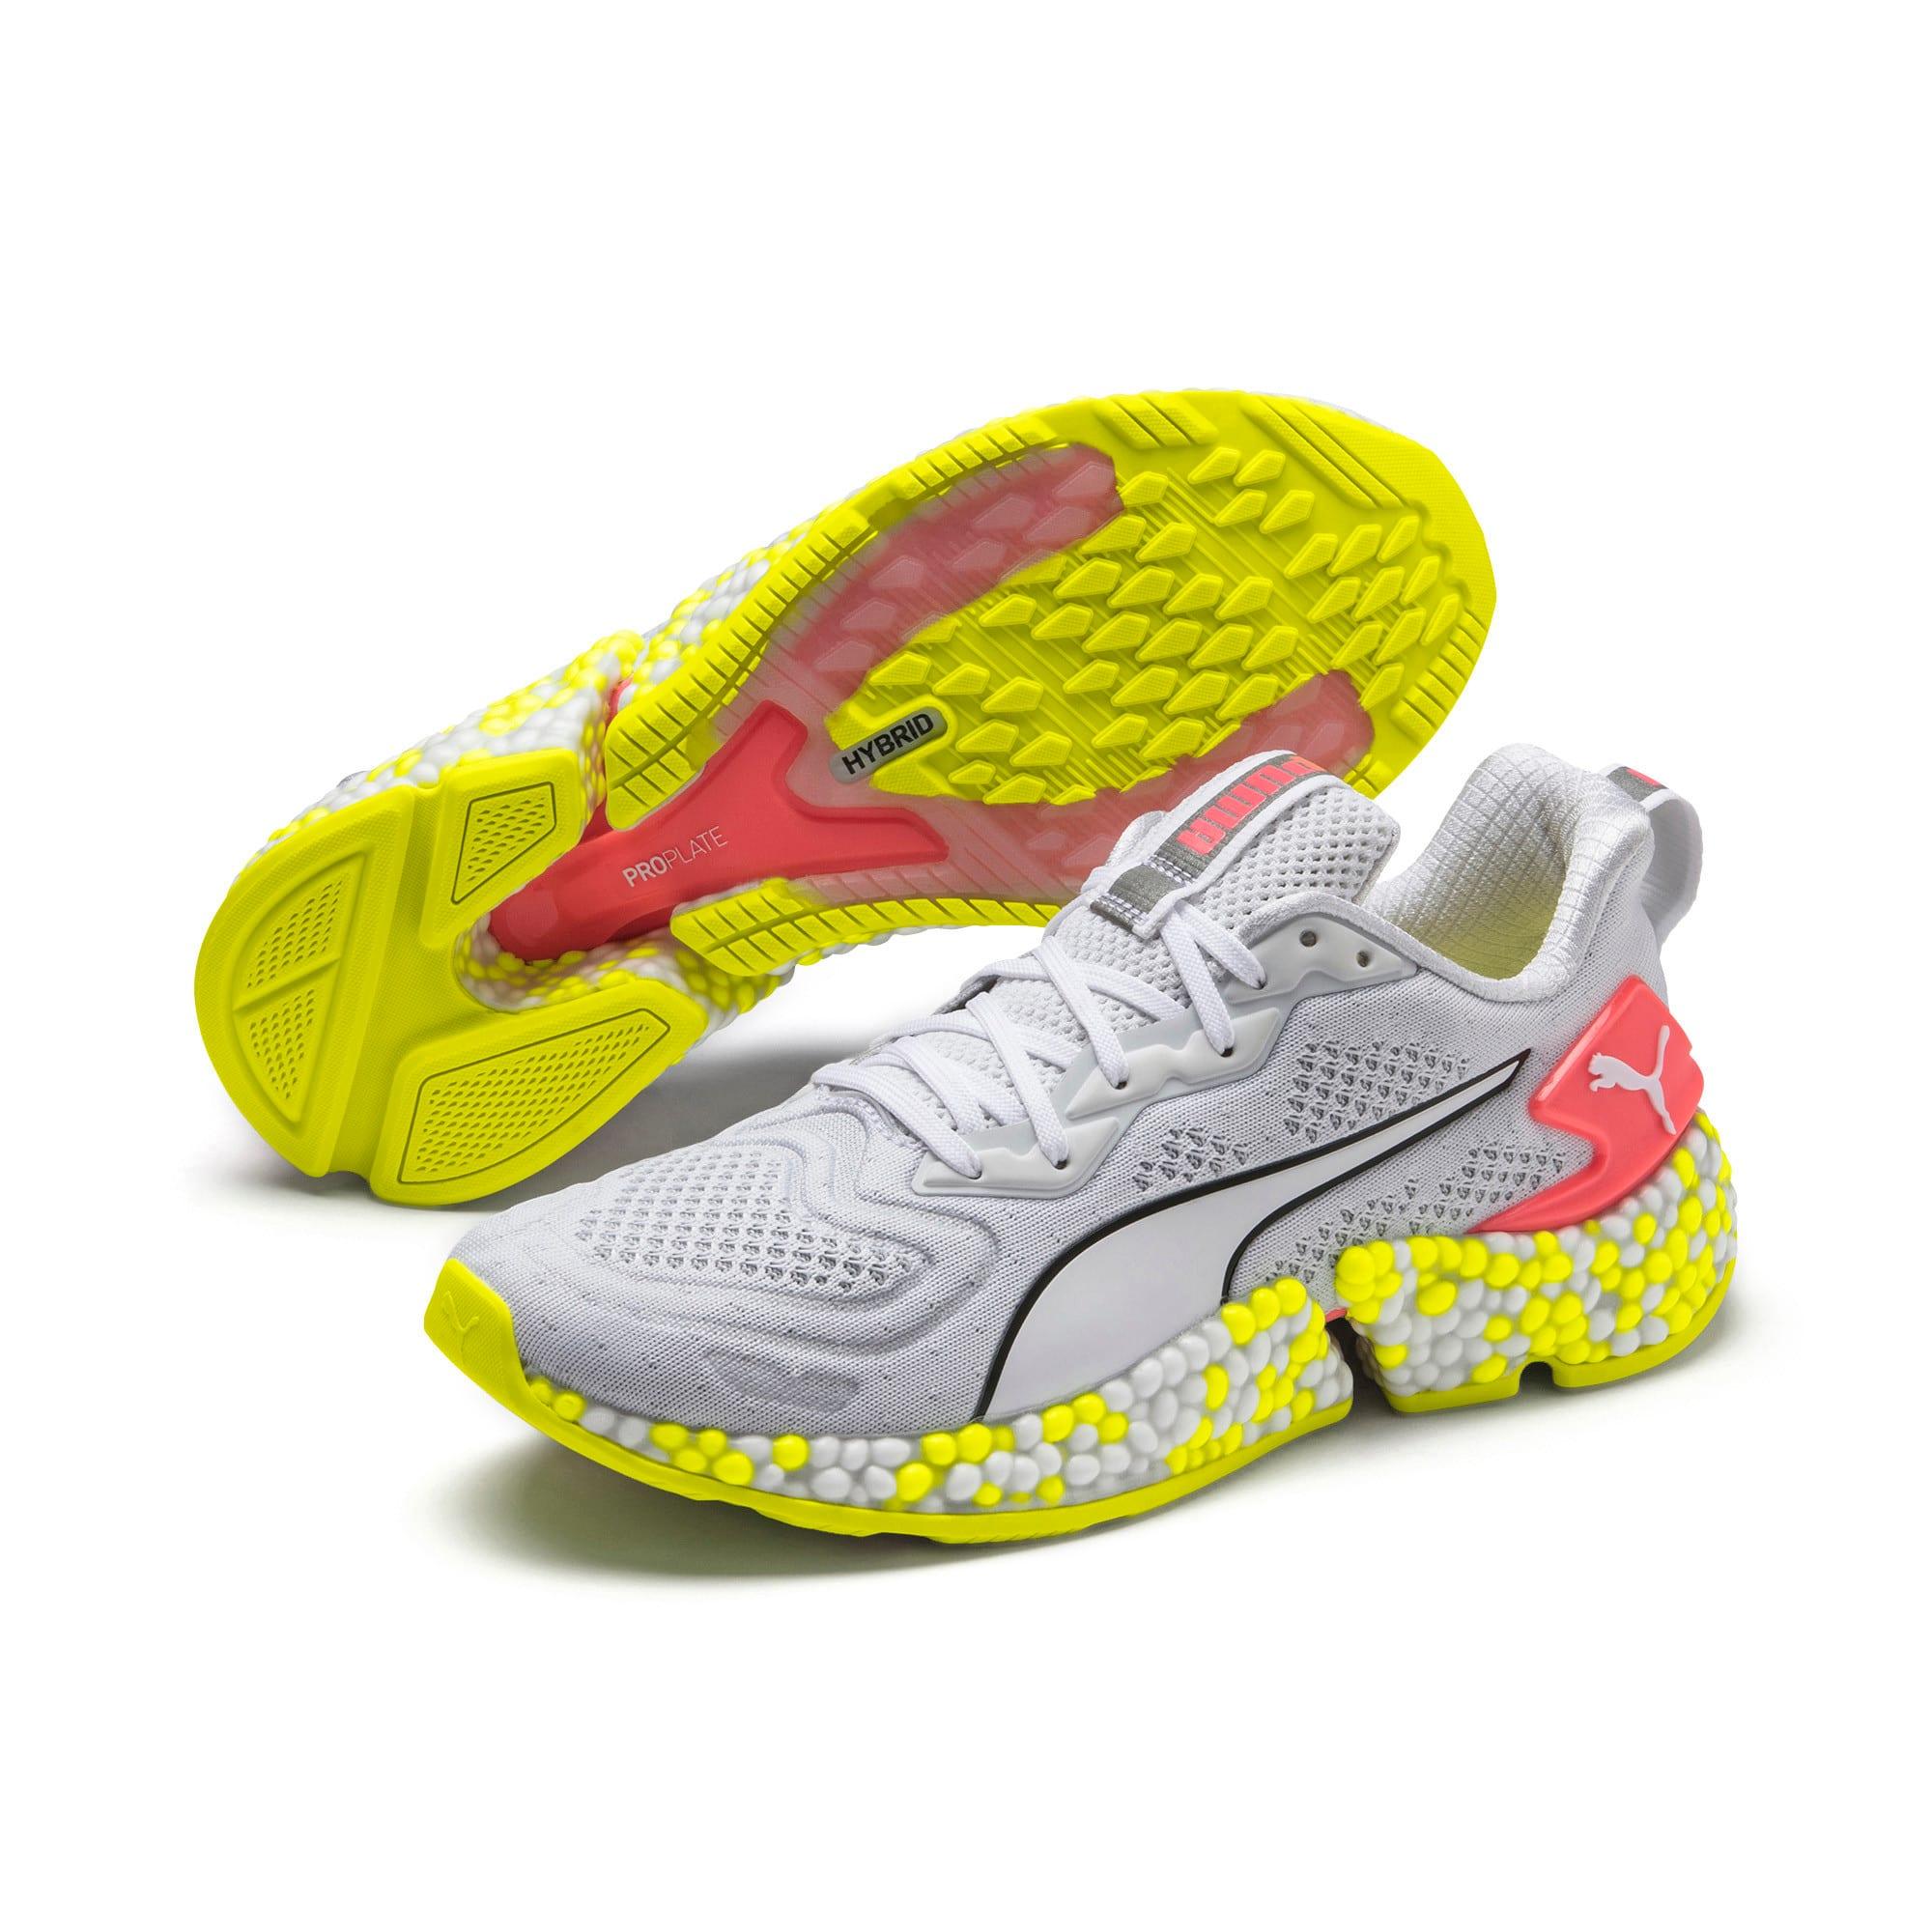 Thumbnail 3 van HYBRID SPEED Orbiter hardloopschoenen voor vrouwen, Puma White-Yellow Alert, medium